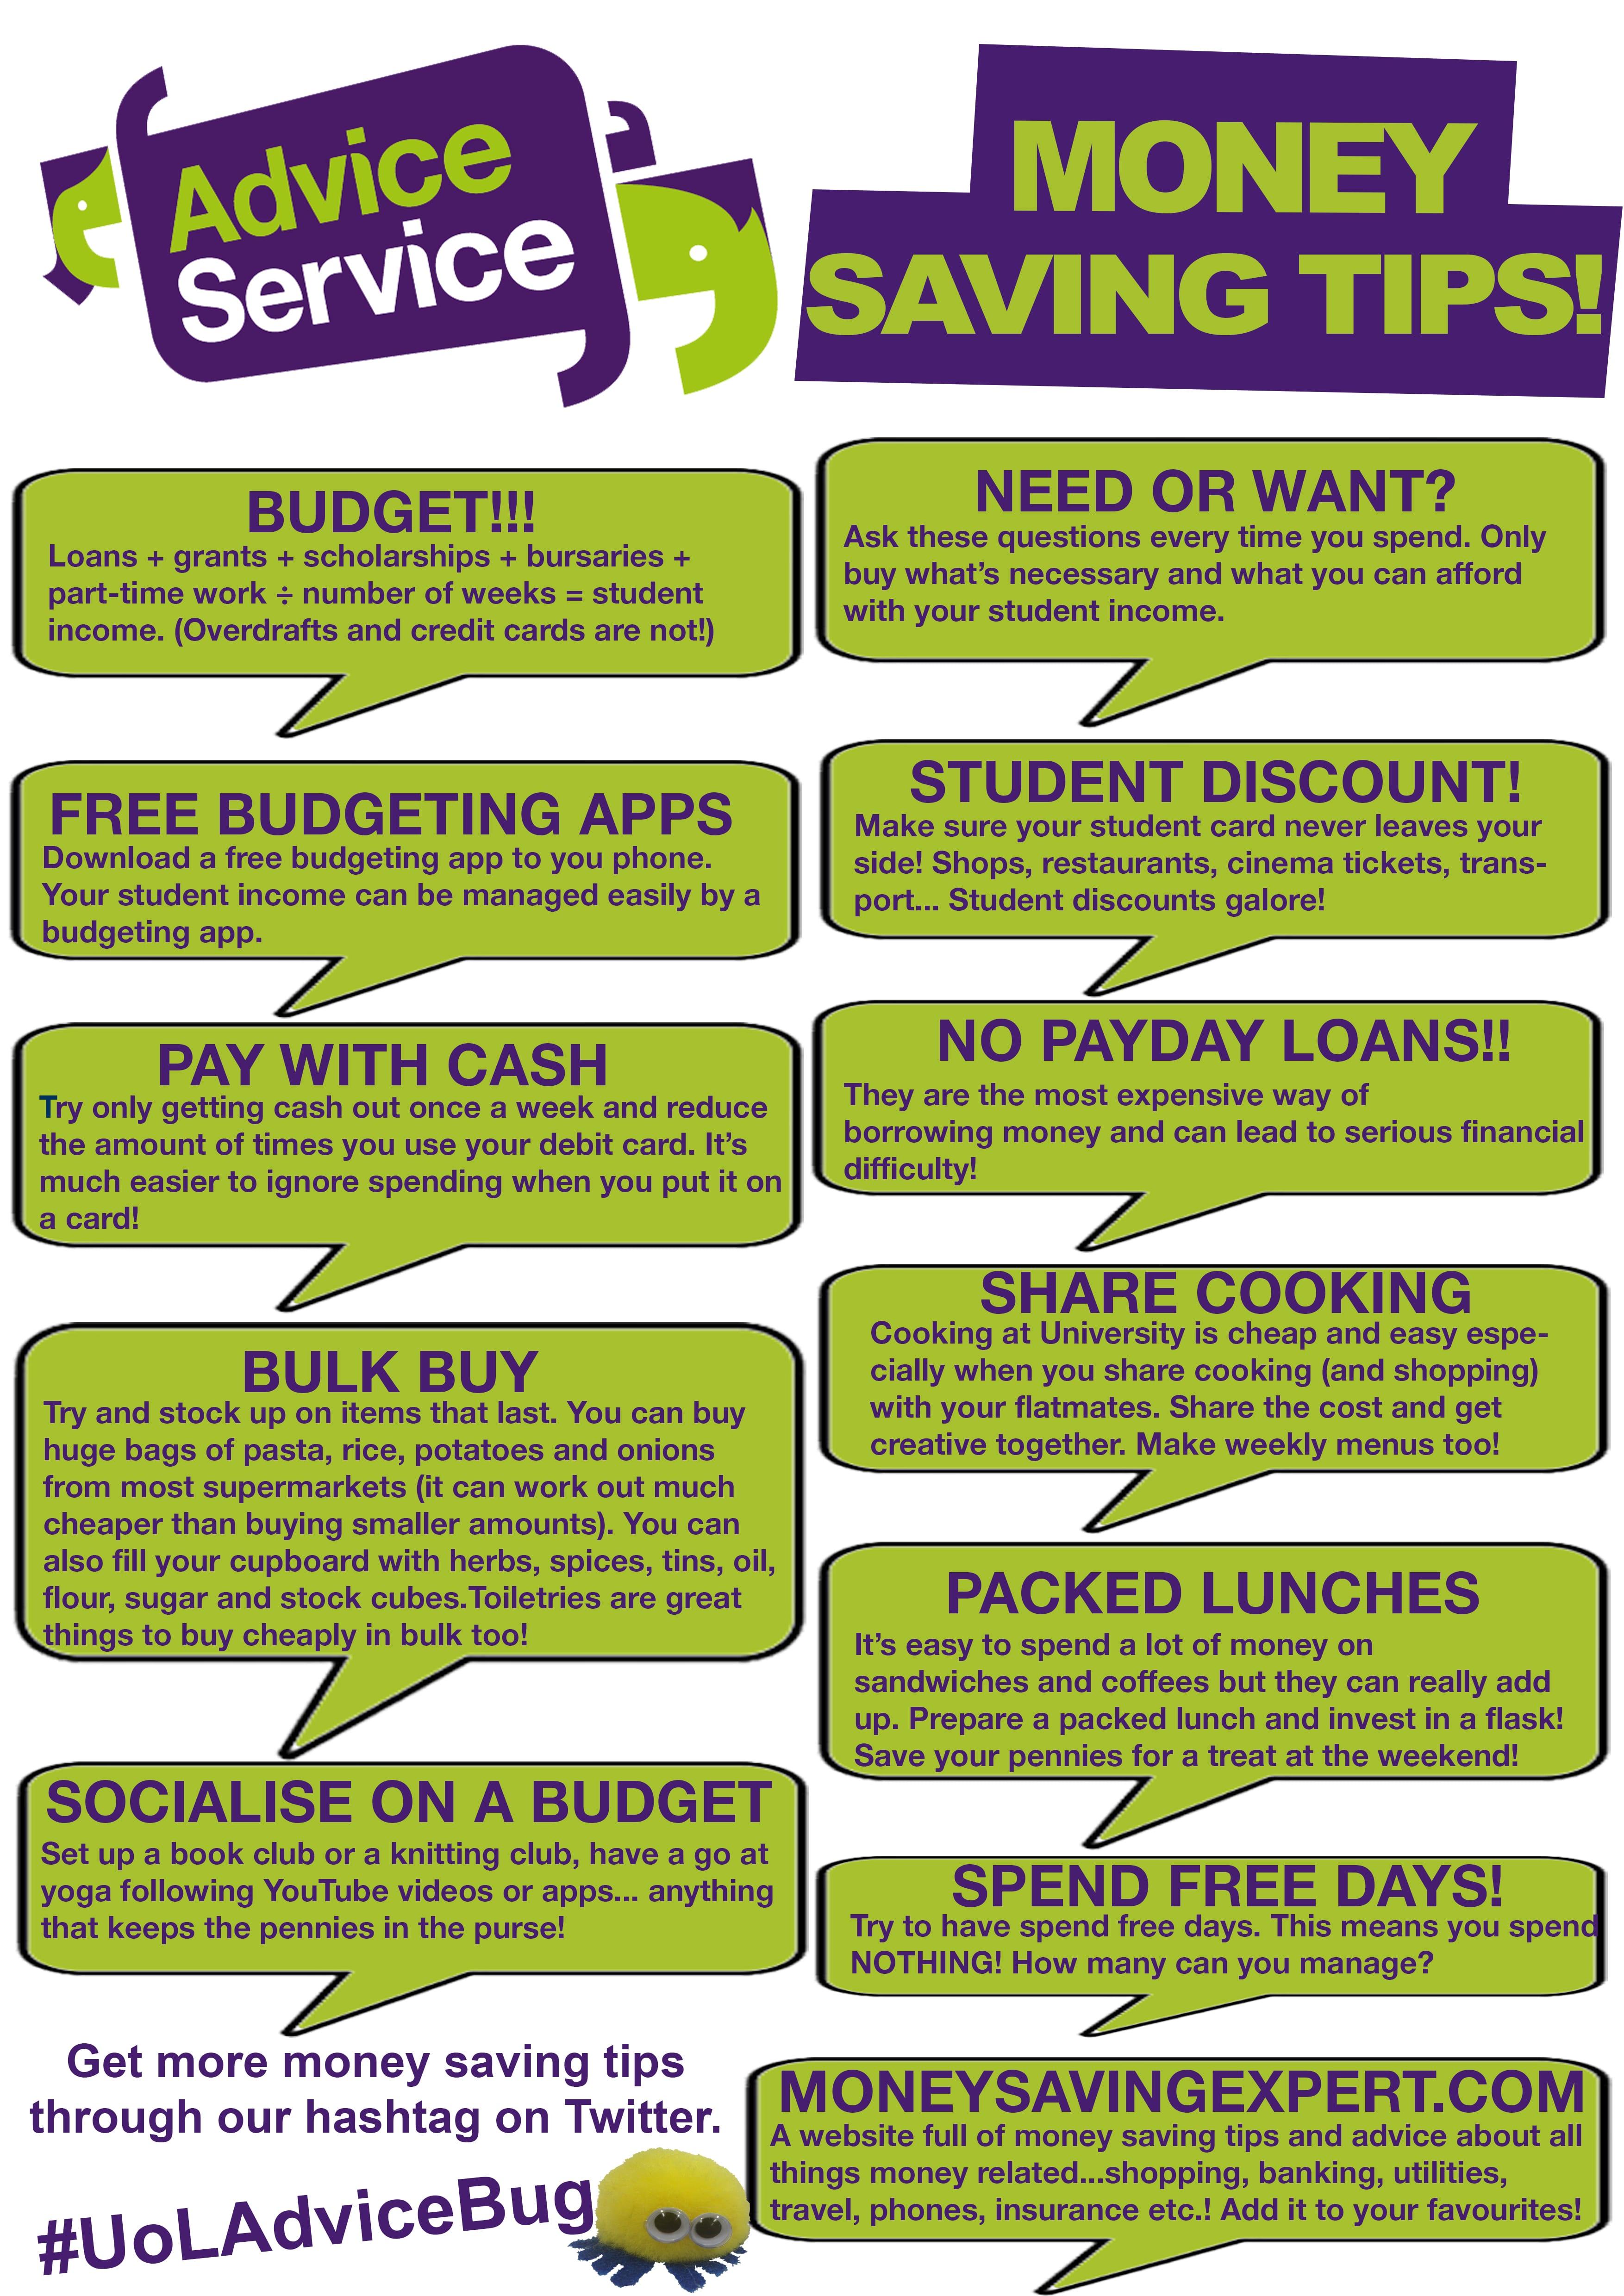 Money Saving Tips Leaflet Advice Service